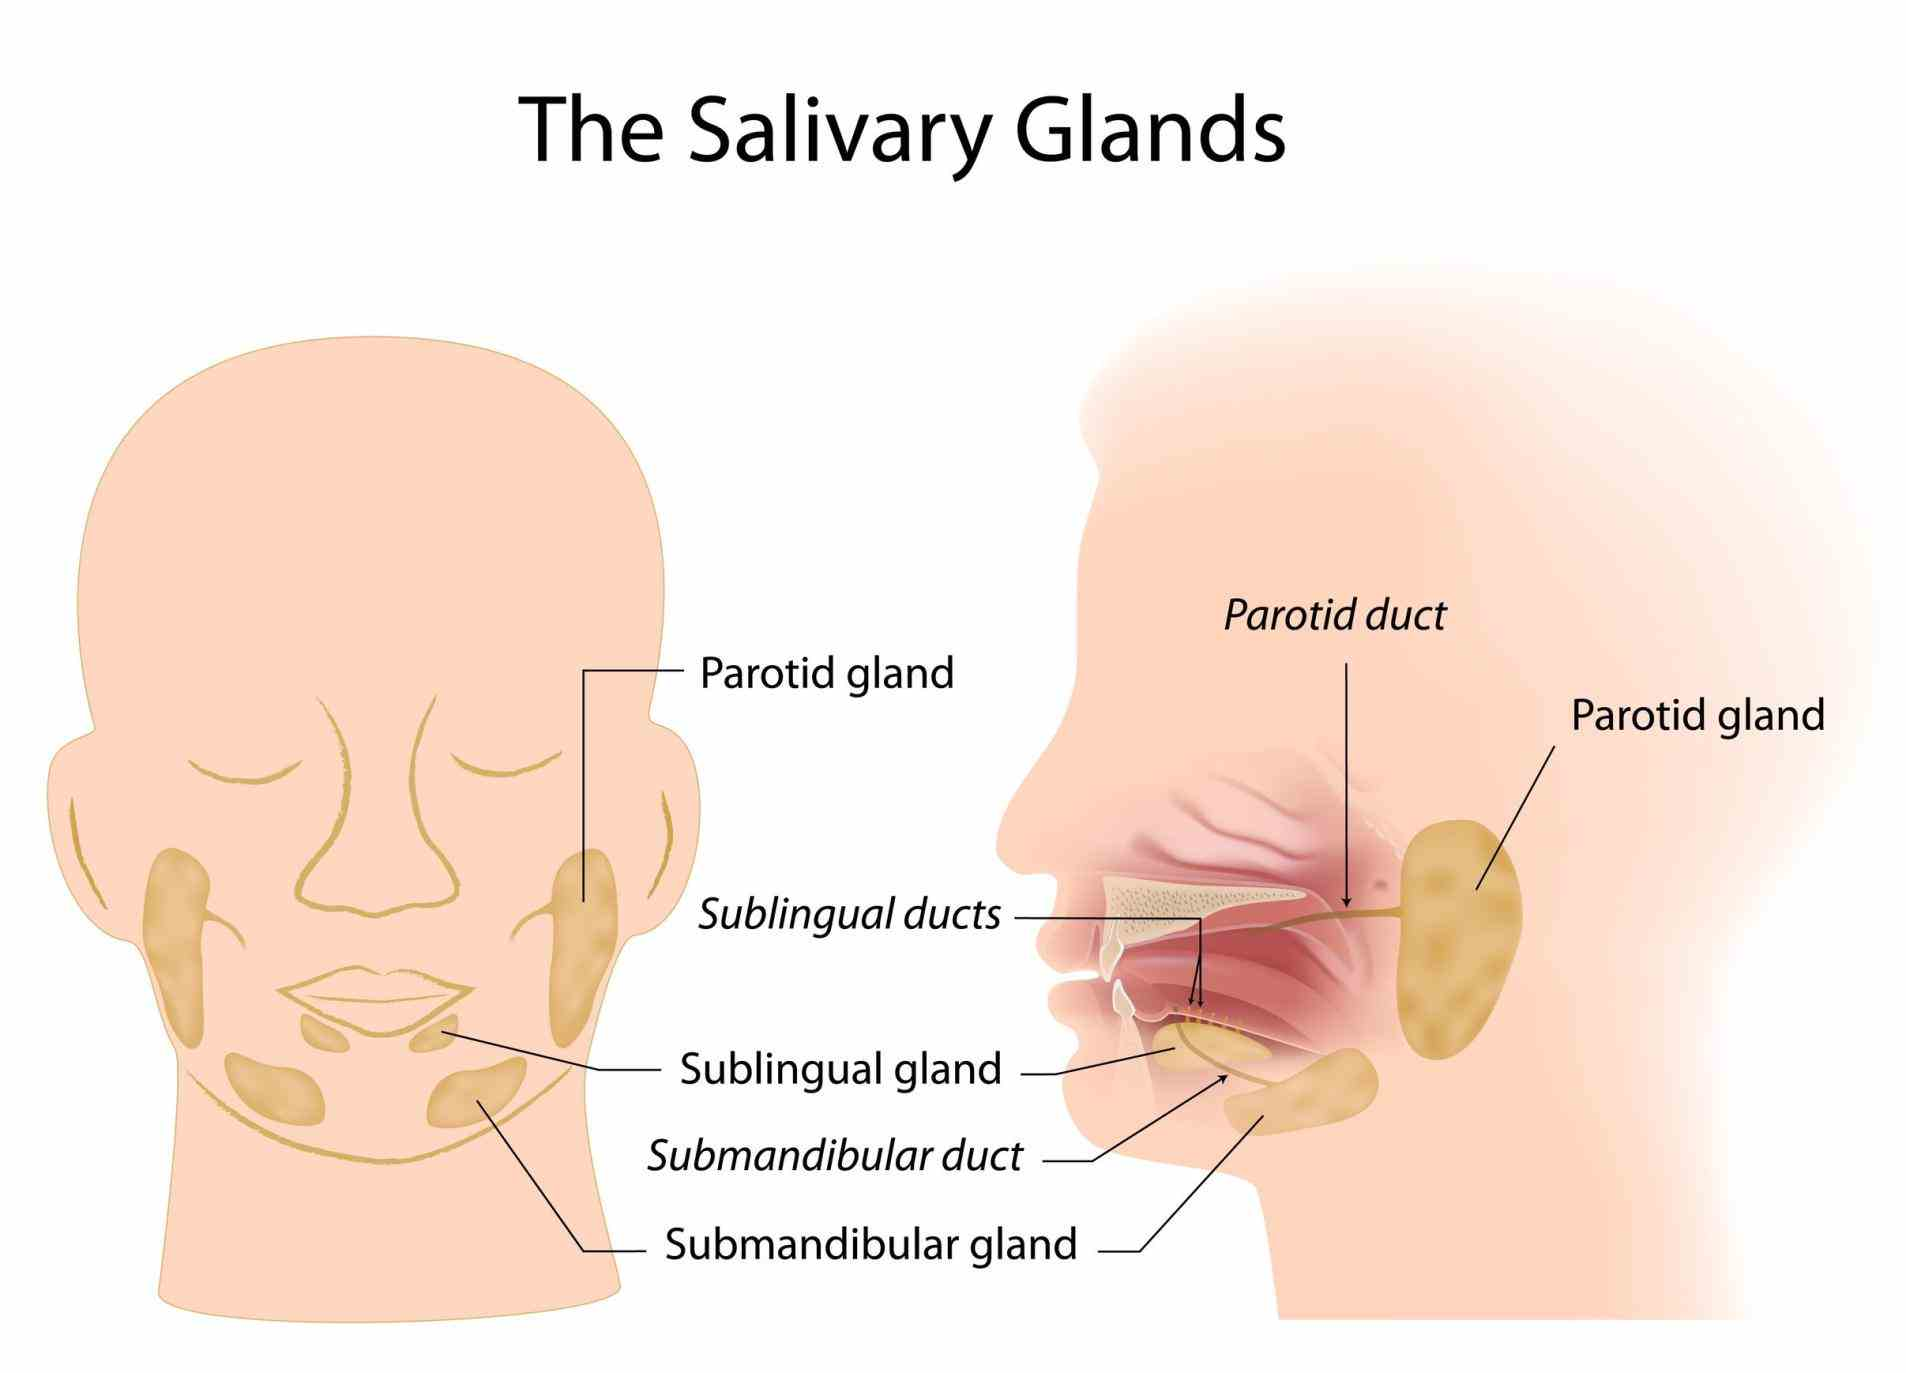 Location Of The Salivary Glands | MedicineBTG.com